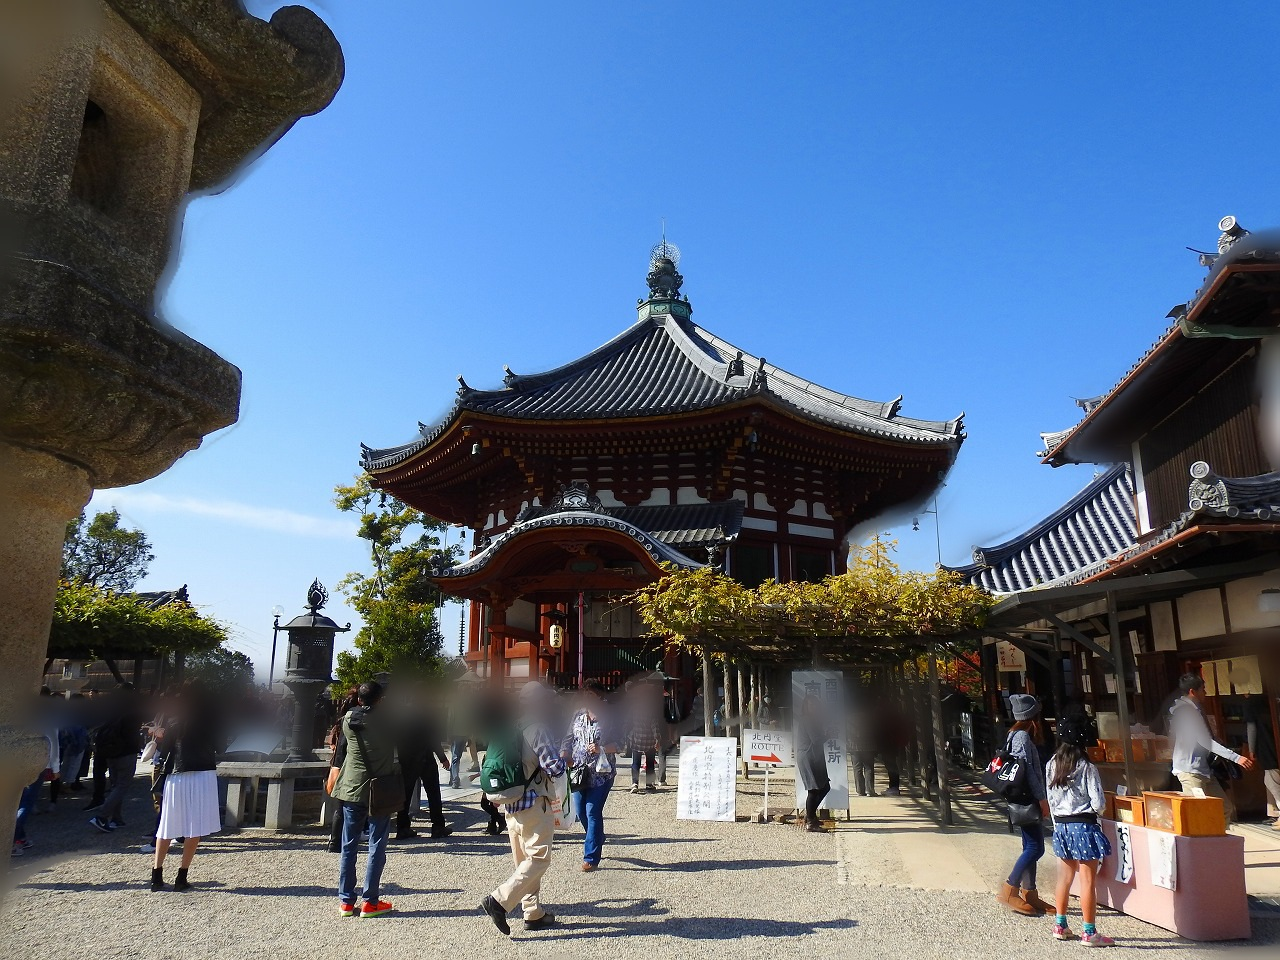 興福寺 南円堂の写真